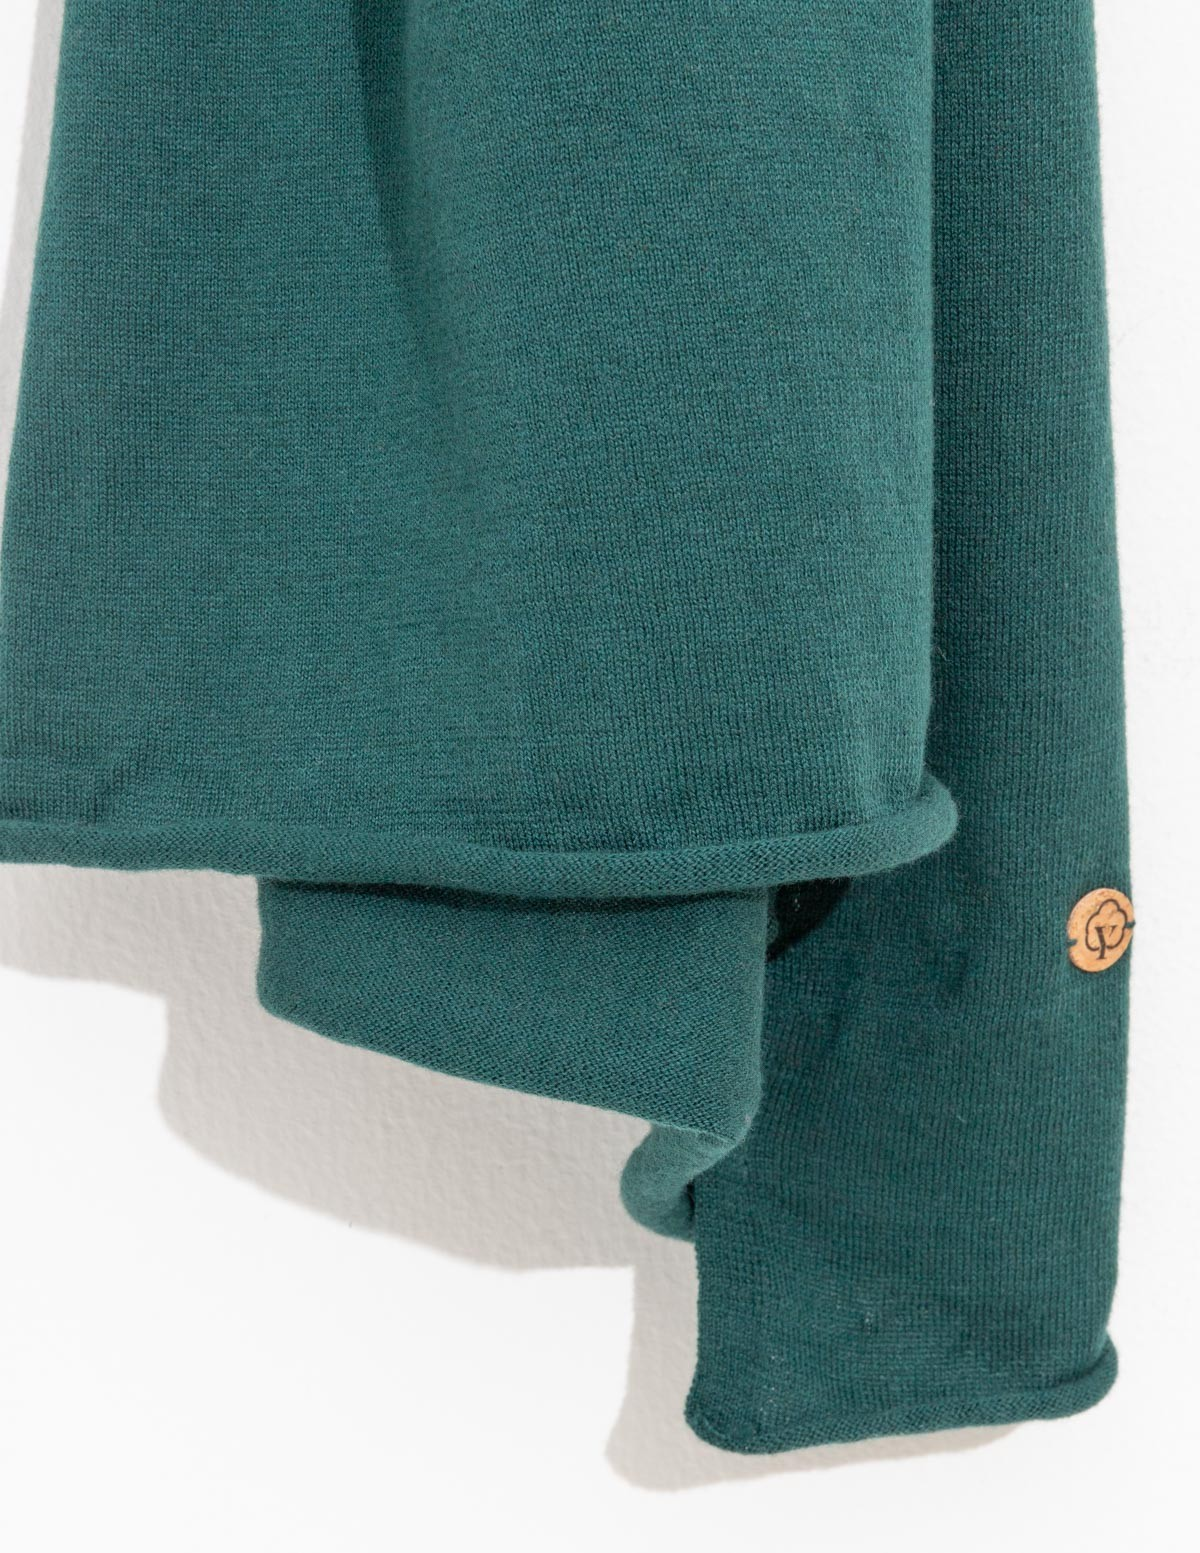 Maxi bufanda algodón orgànico - Ítem2